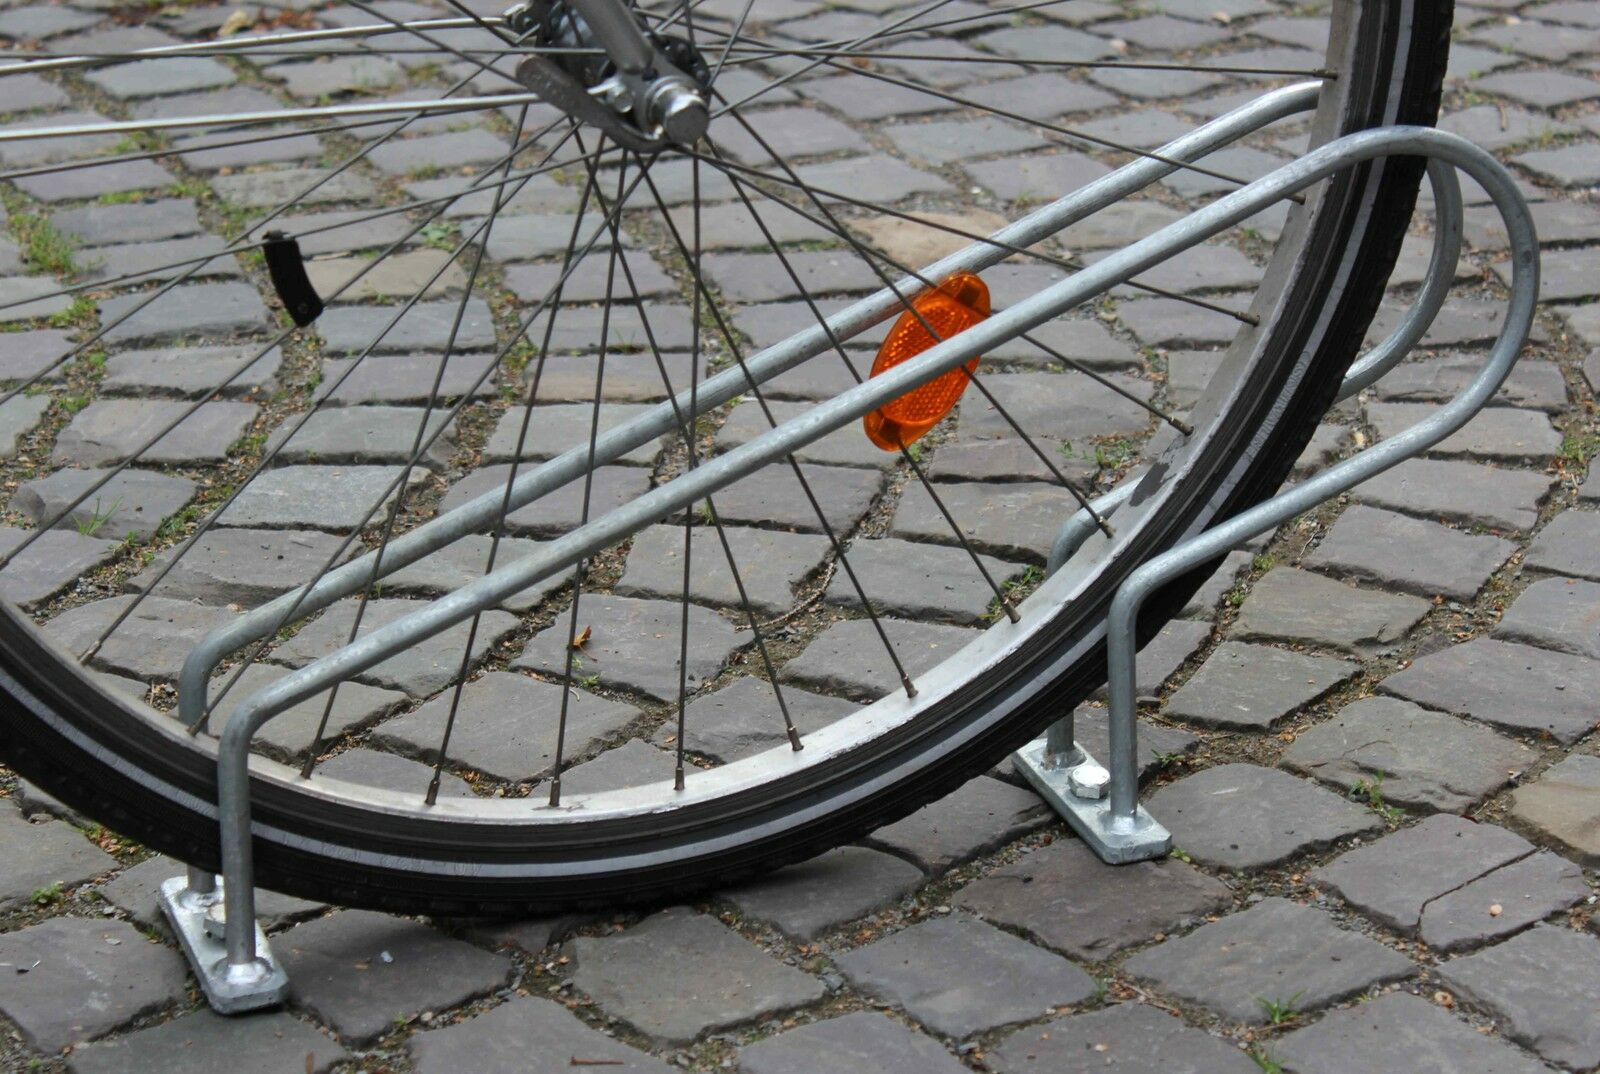 2 trozo de soporte de bicicleta 20,45   stk. perchas soporte bicicleta aparCoche bicicleta Parker